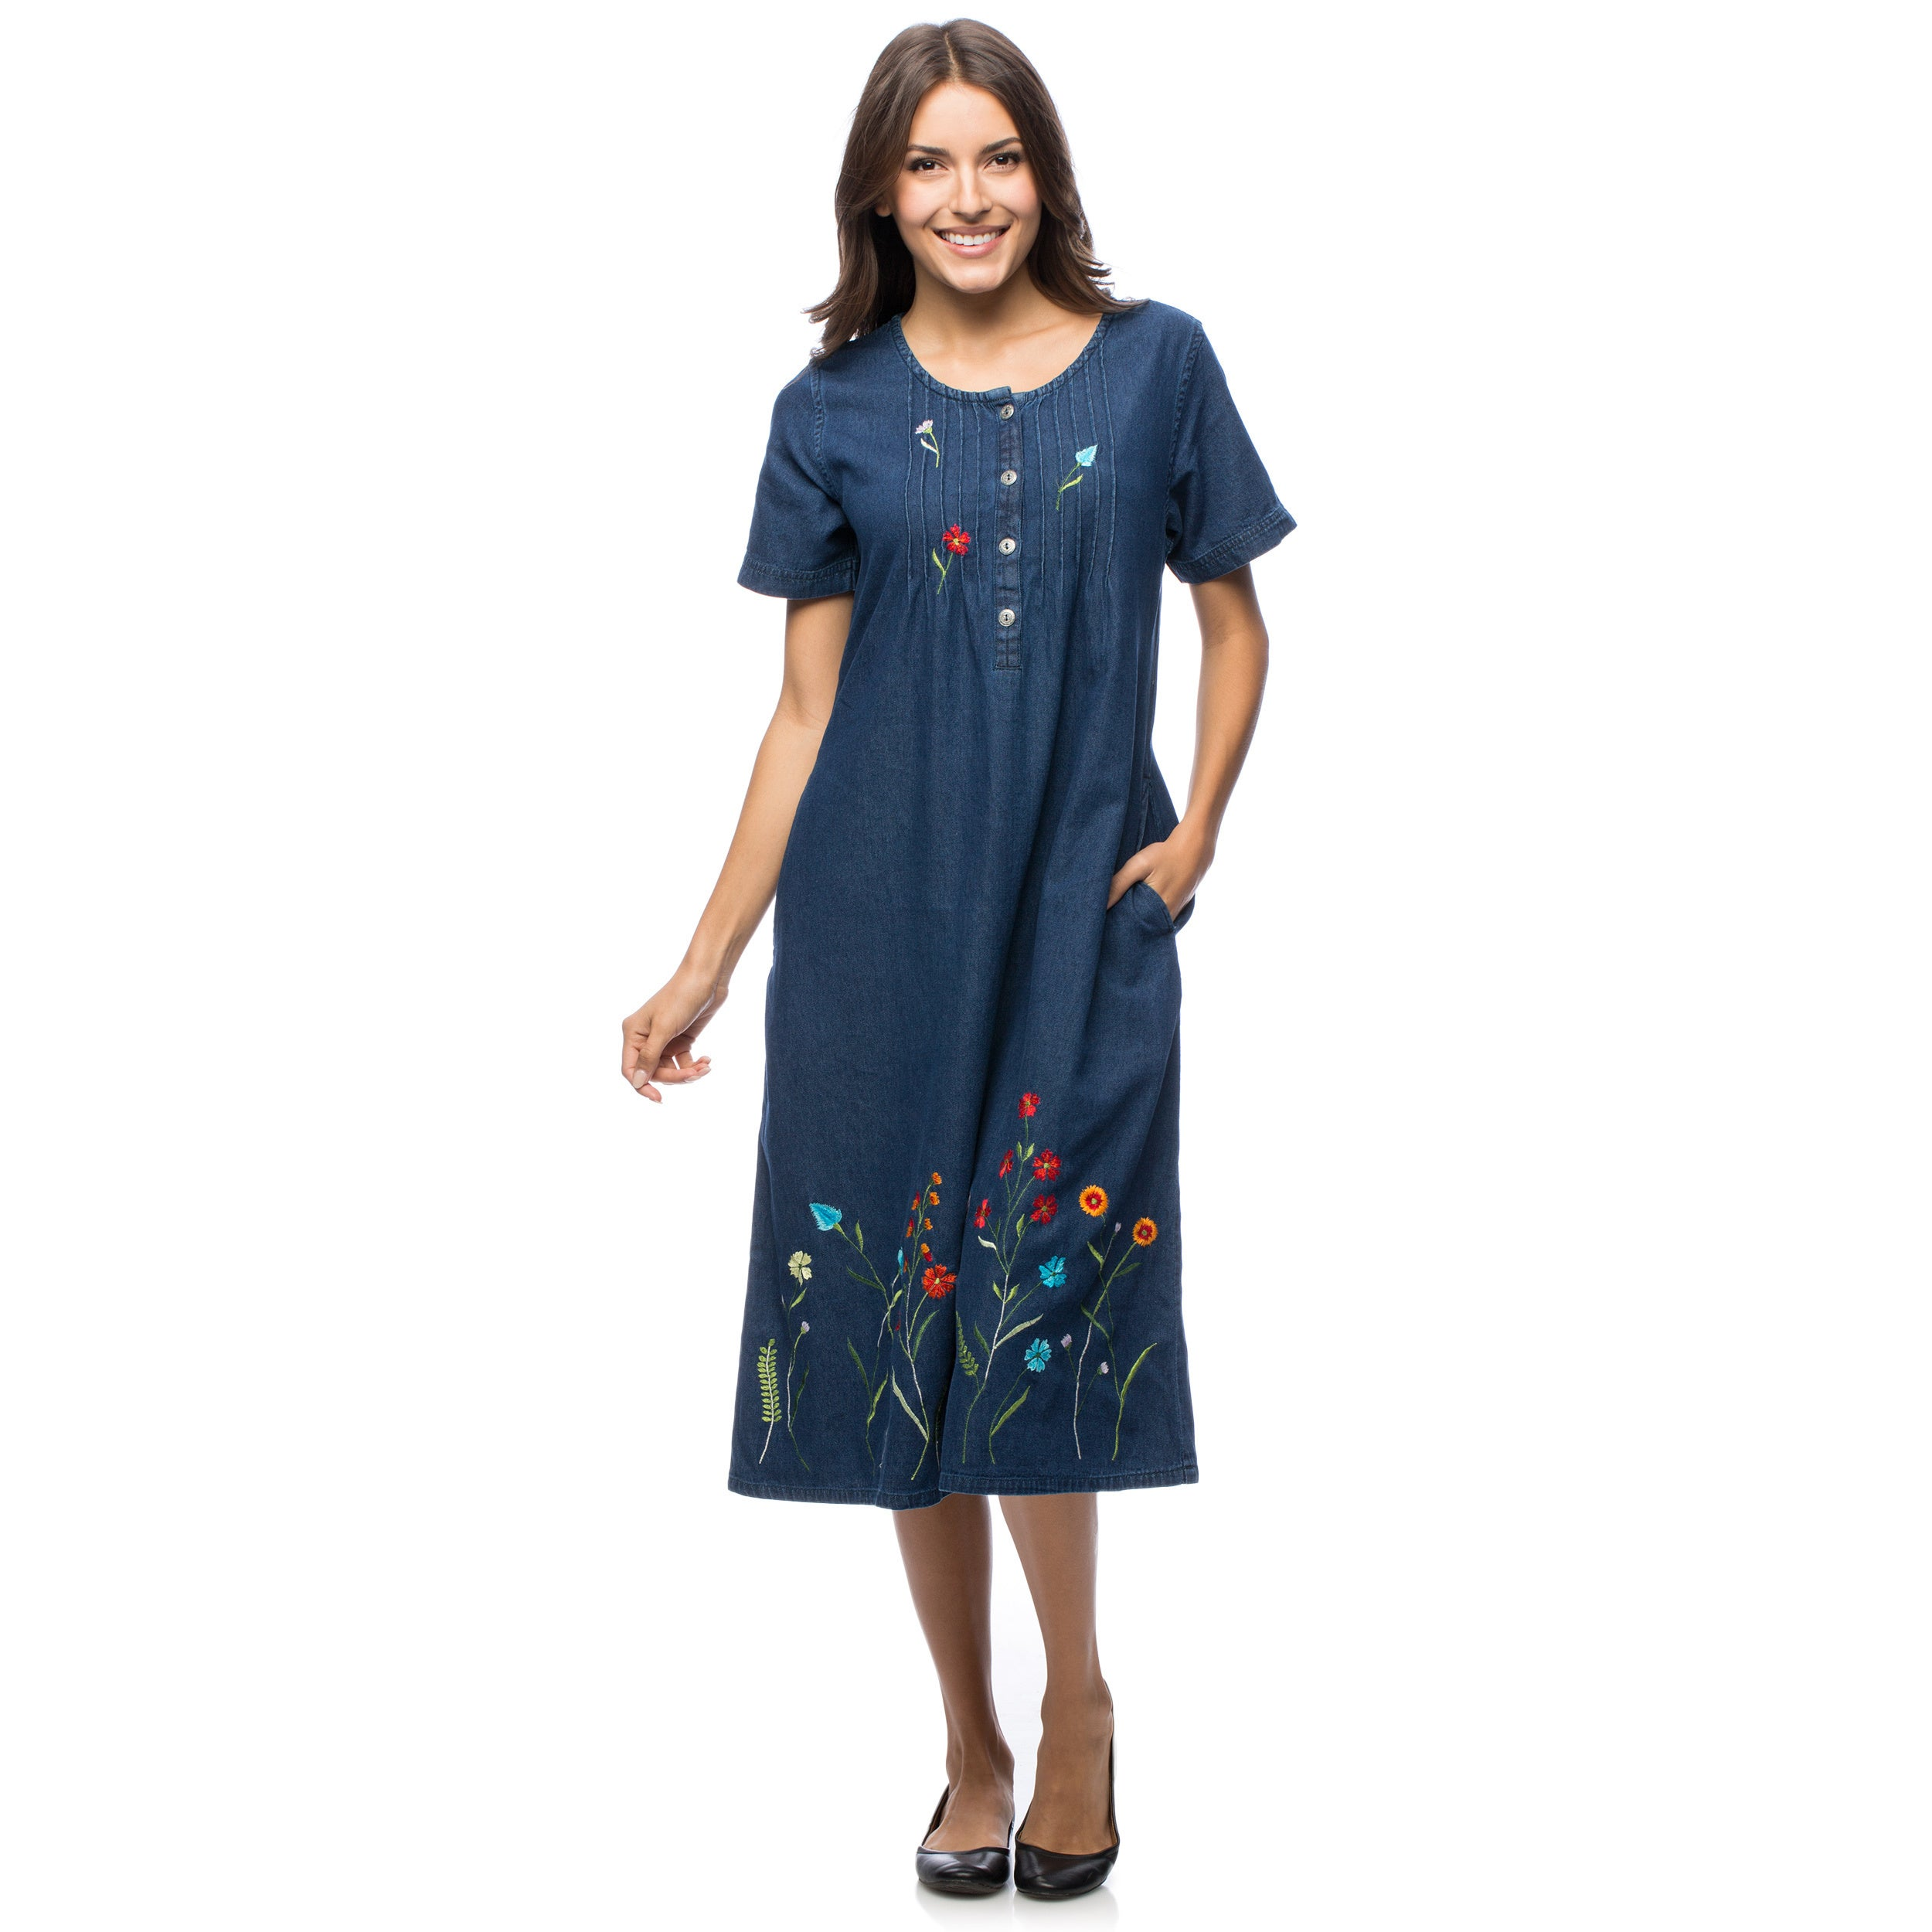 La Cera Women's Embroidered Denim Dress (M), Blue